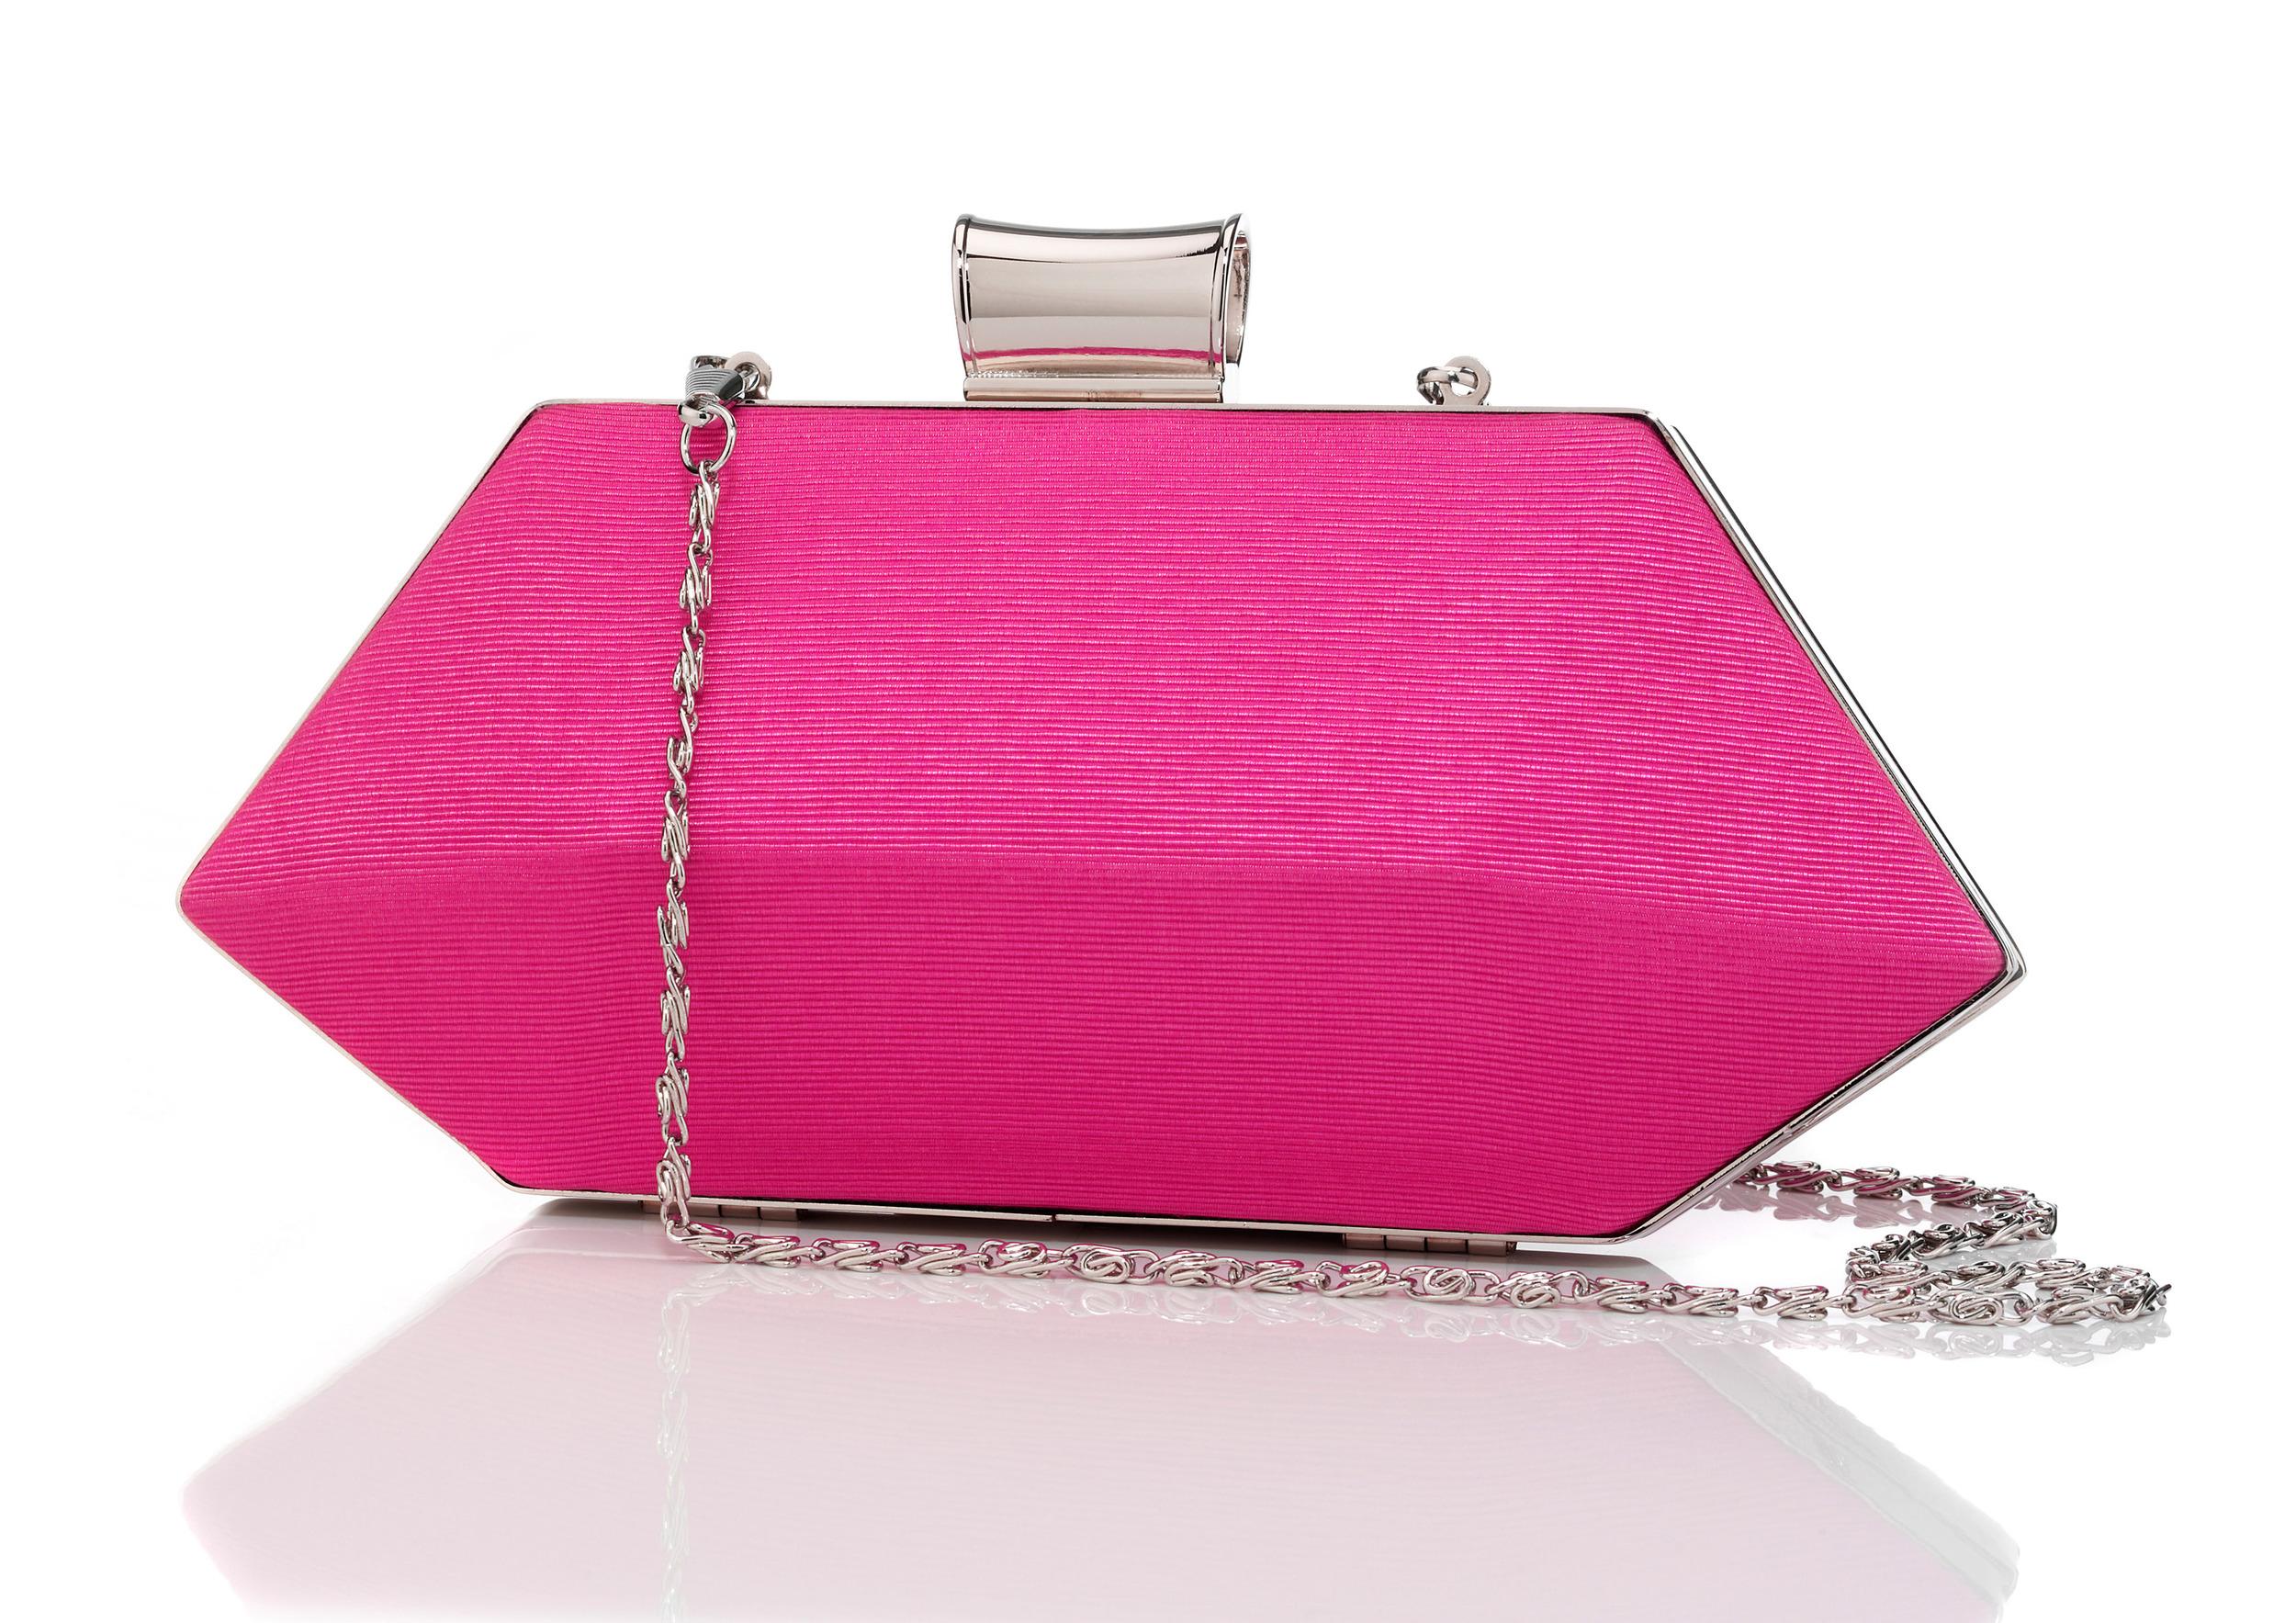 F M pink clutch bag.jpg